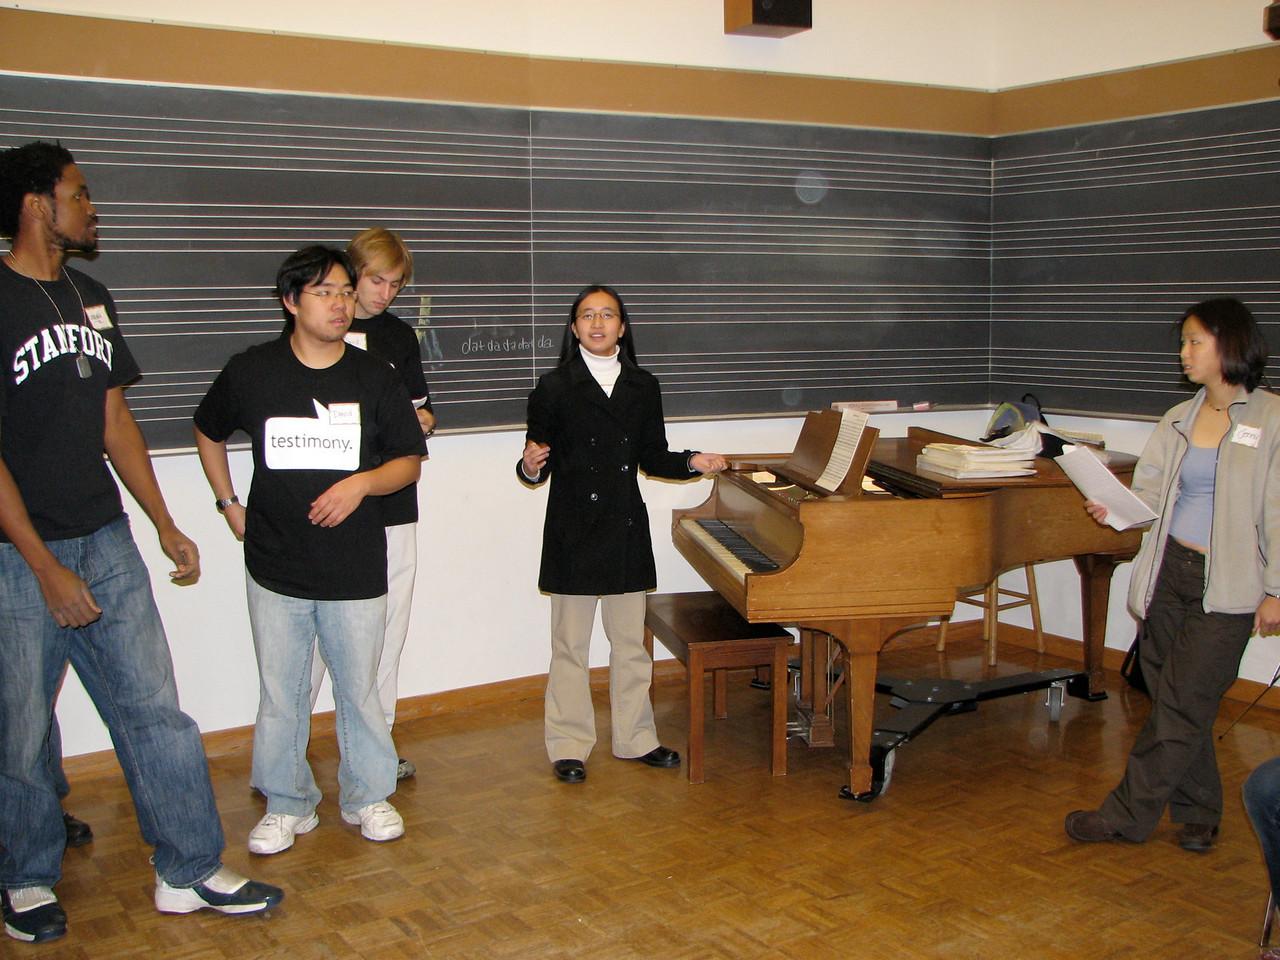 2006 12 02 Sat - Uchenna Okoye, David Chiang, David Scudder, Tina Wong, & Jenny Alyono